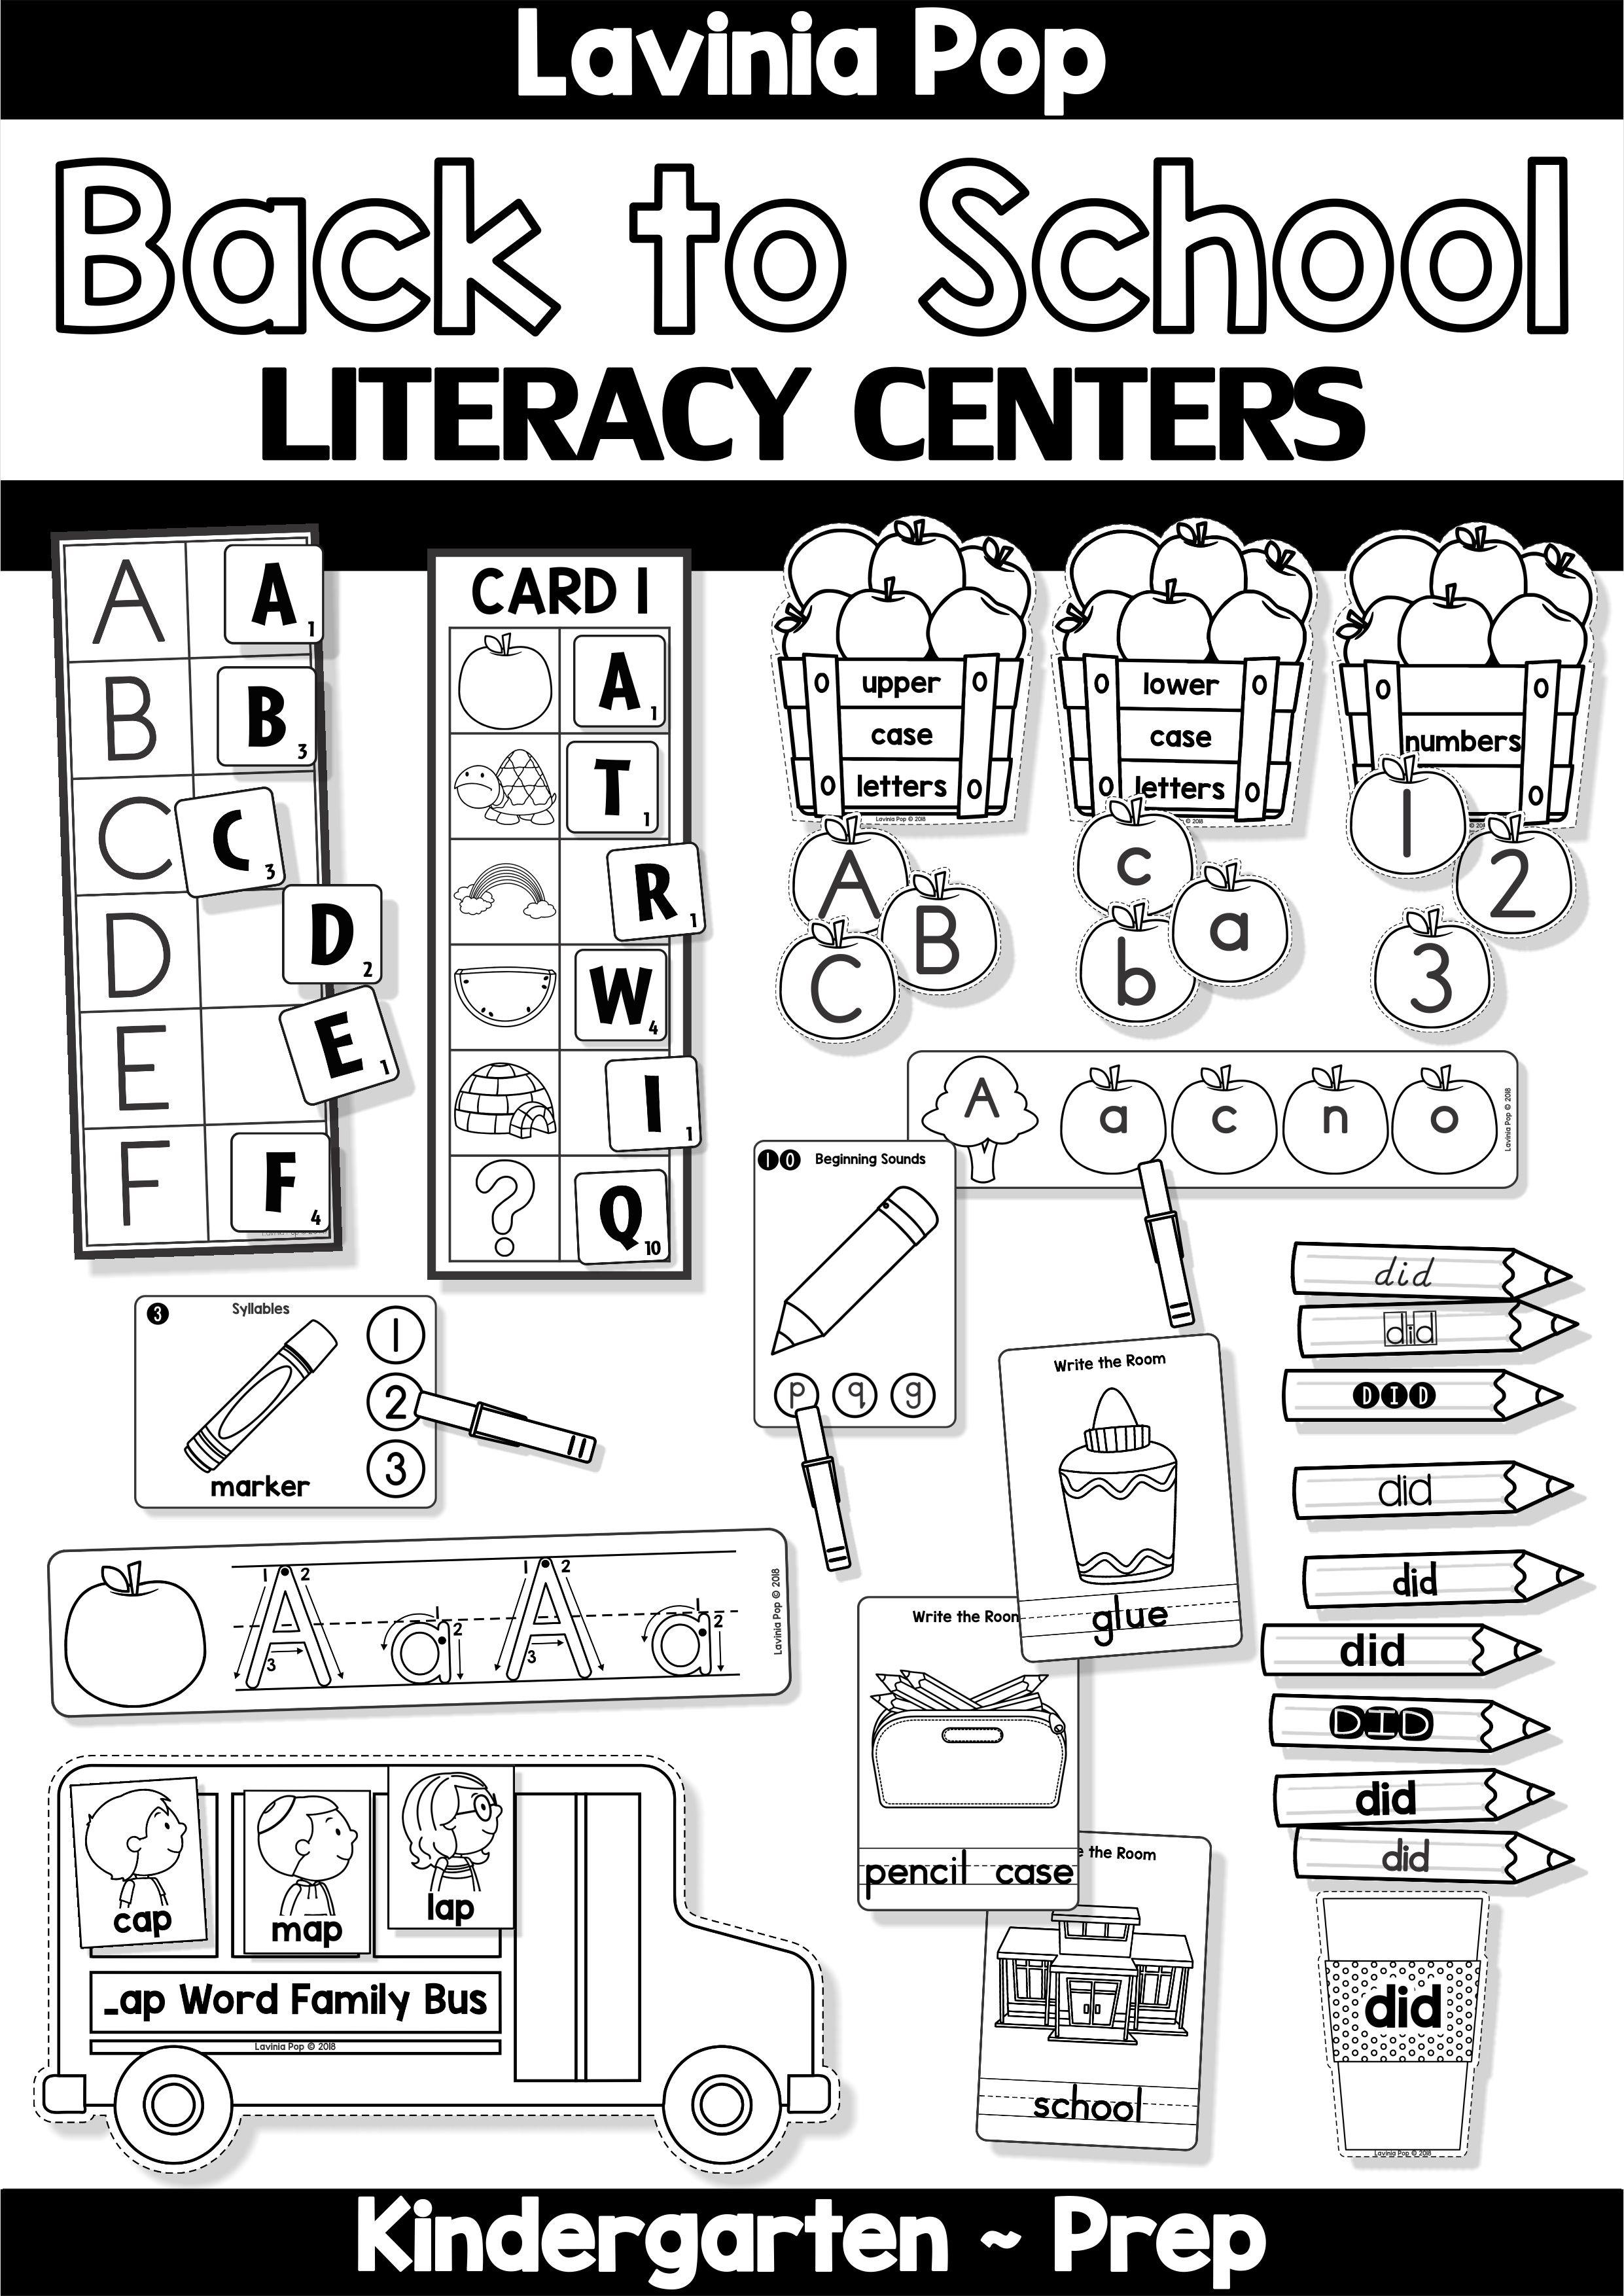 Back To School Literacy Centers For Kindergarten B Amp W